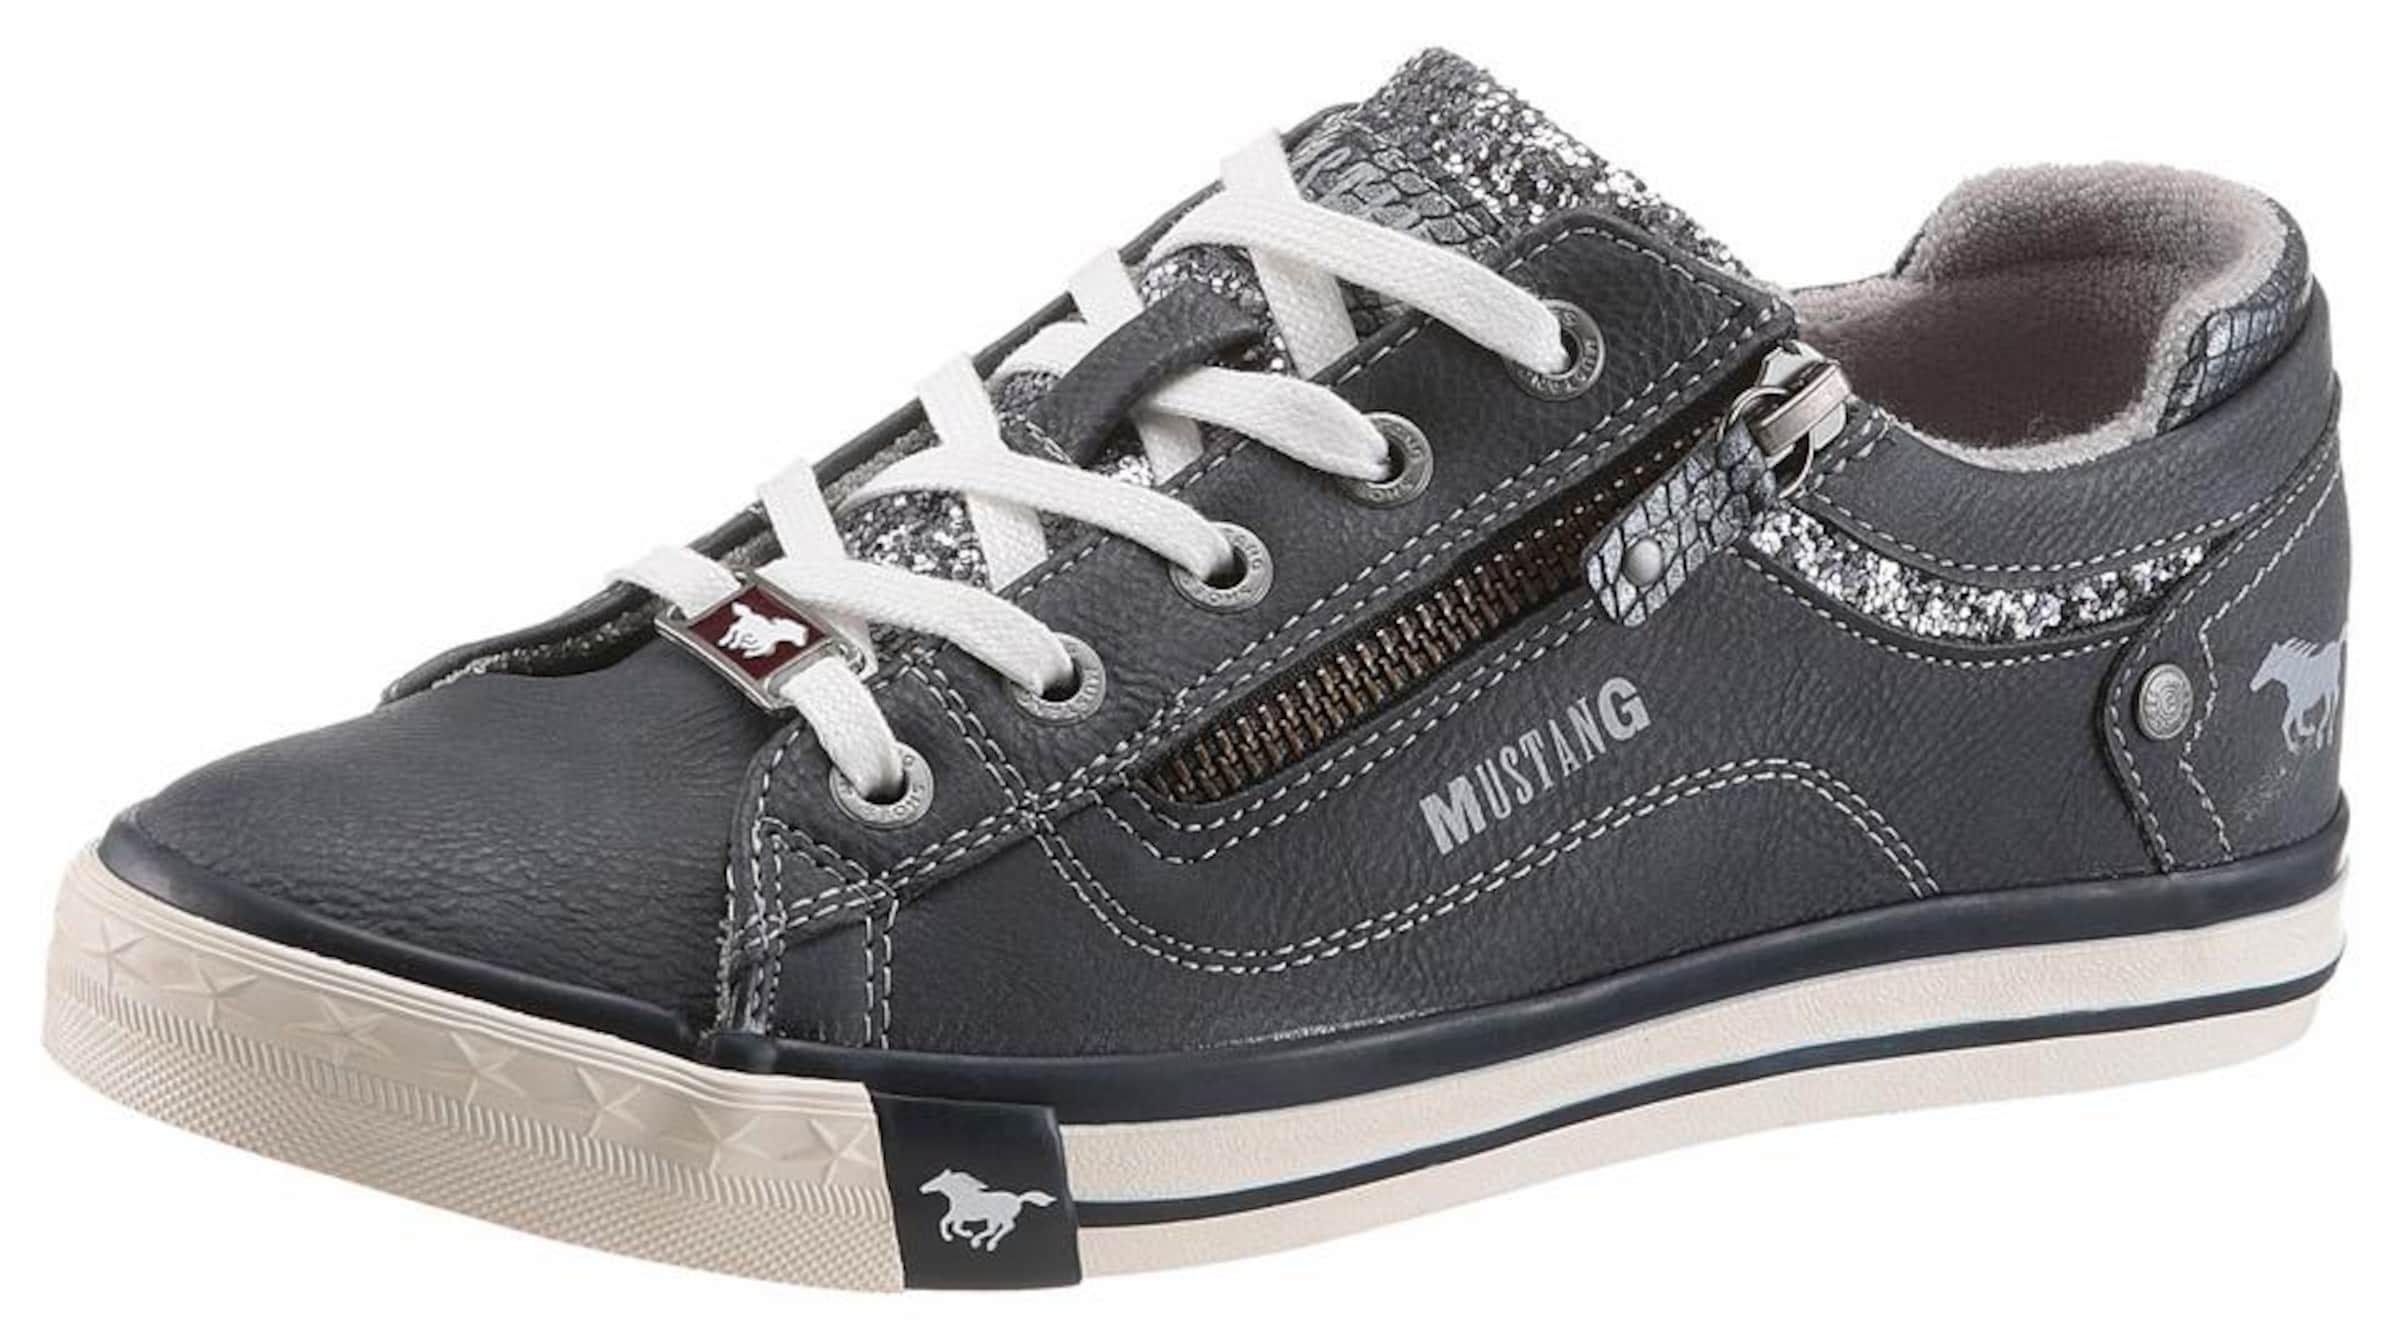 MUSTANG Sneakers Billige Neue Stile 4HzDs4